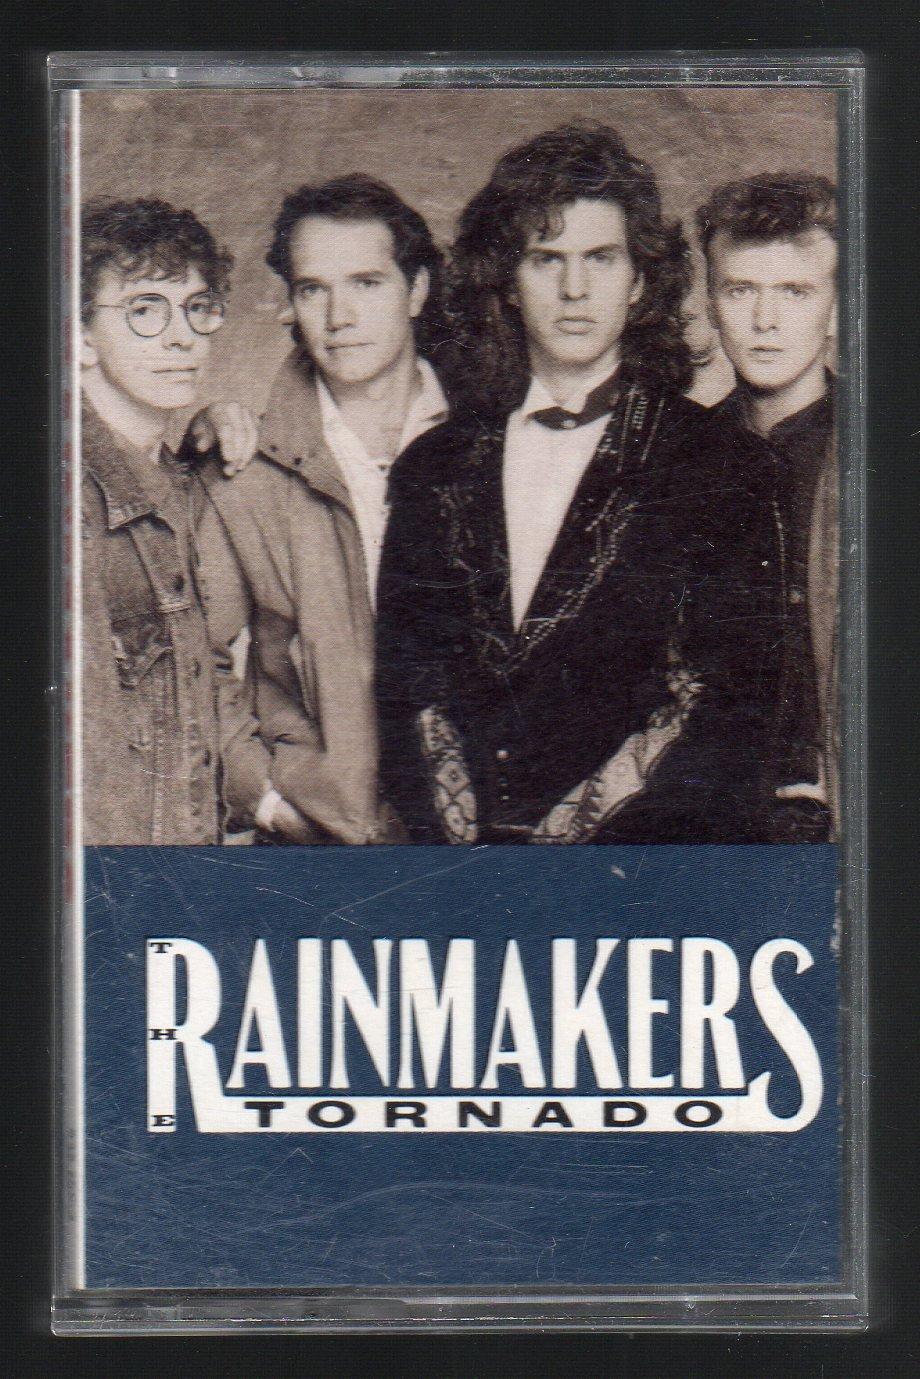 The Rainmakers - Tornado Cassette Tape